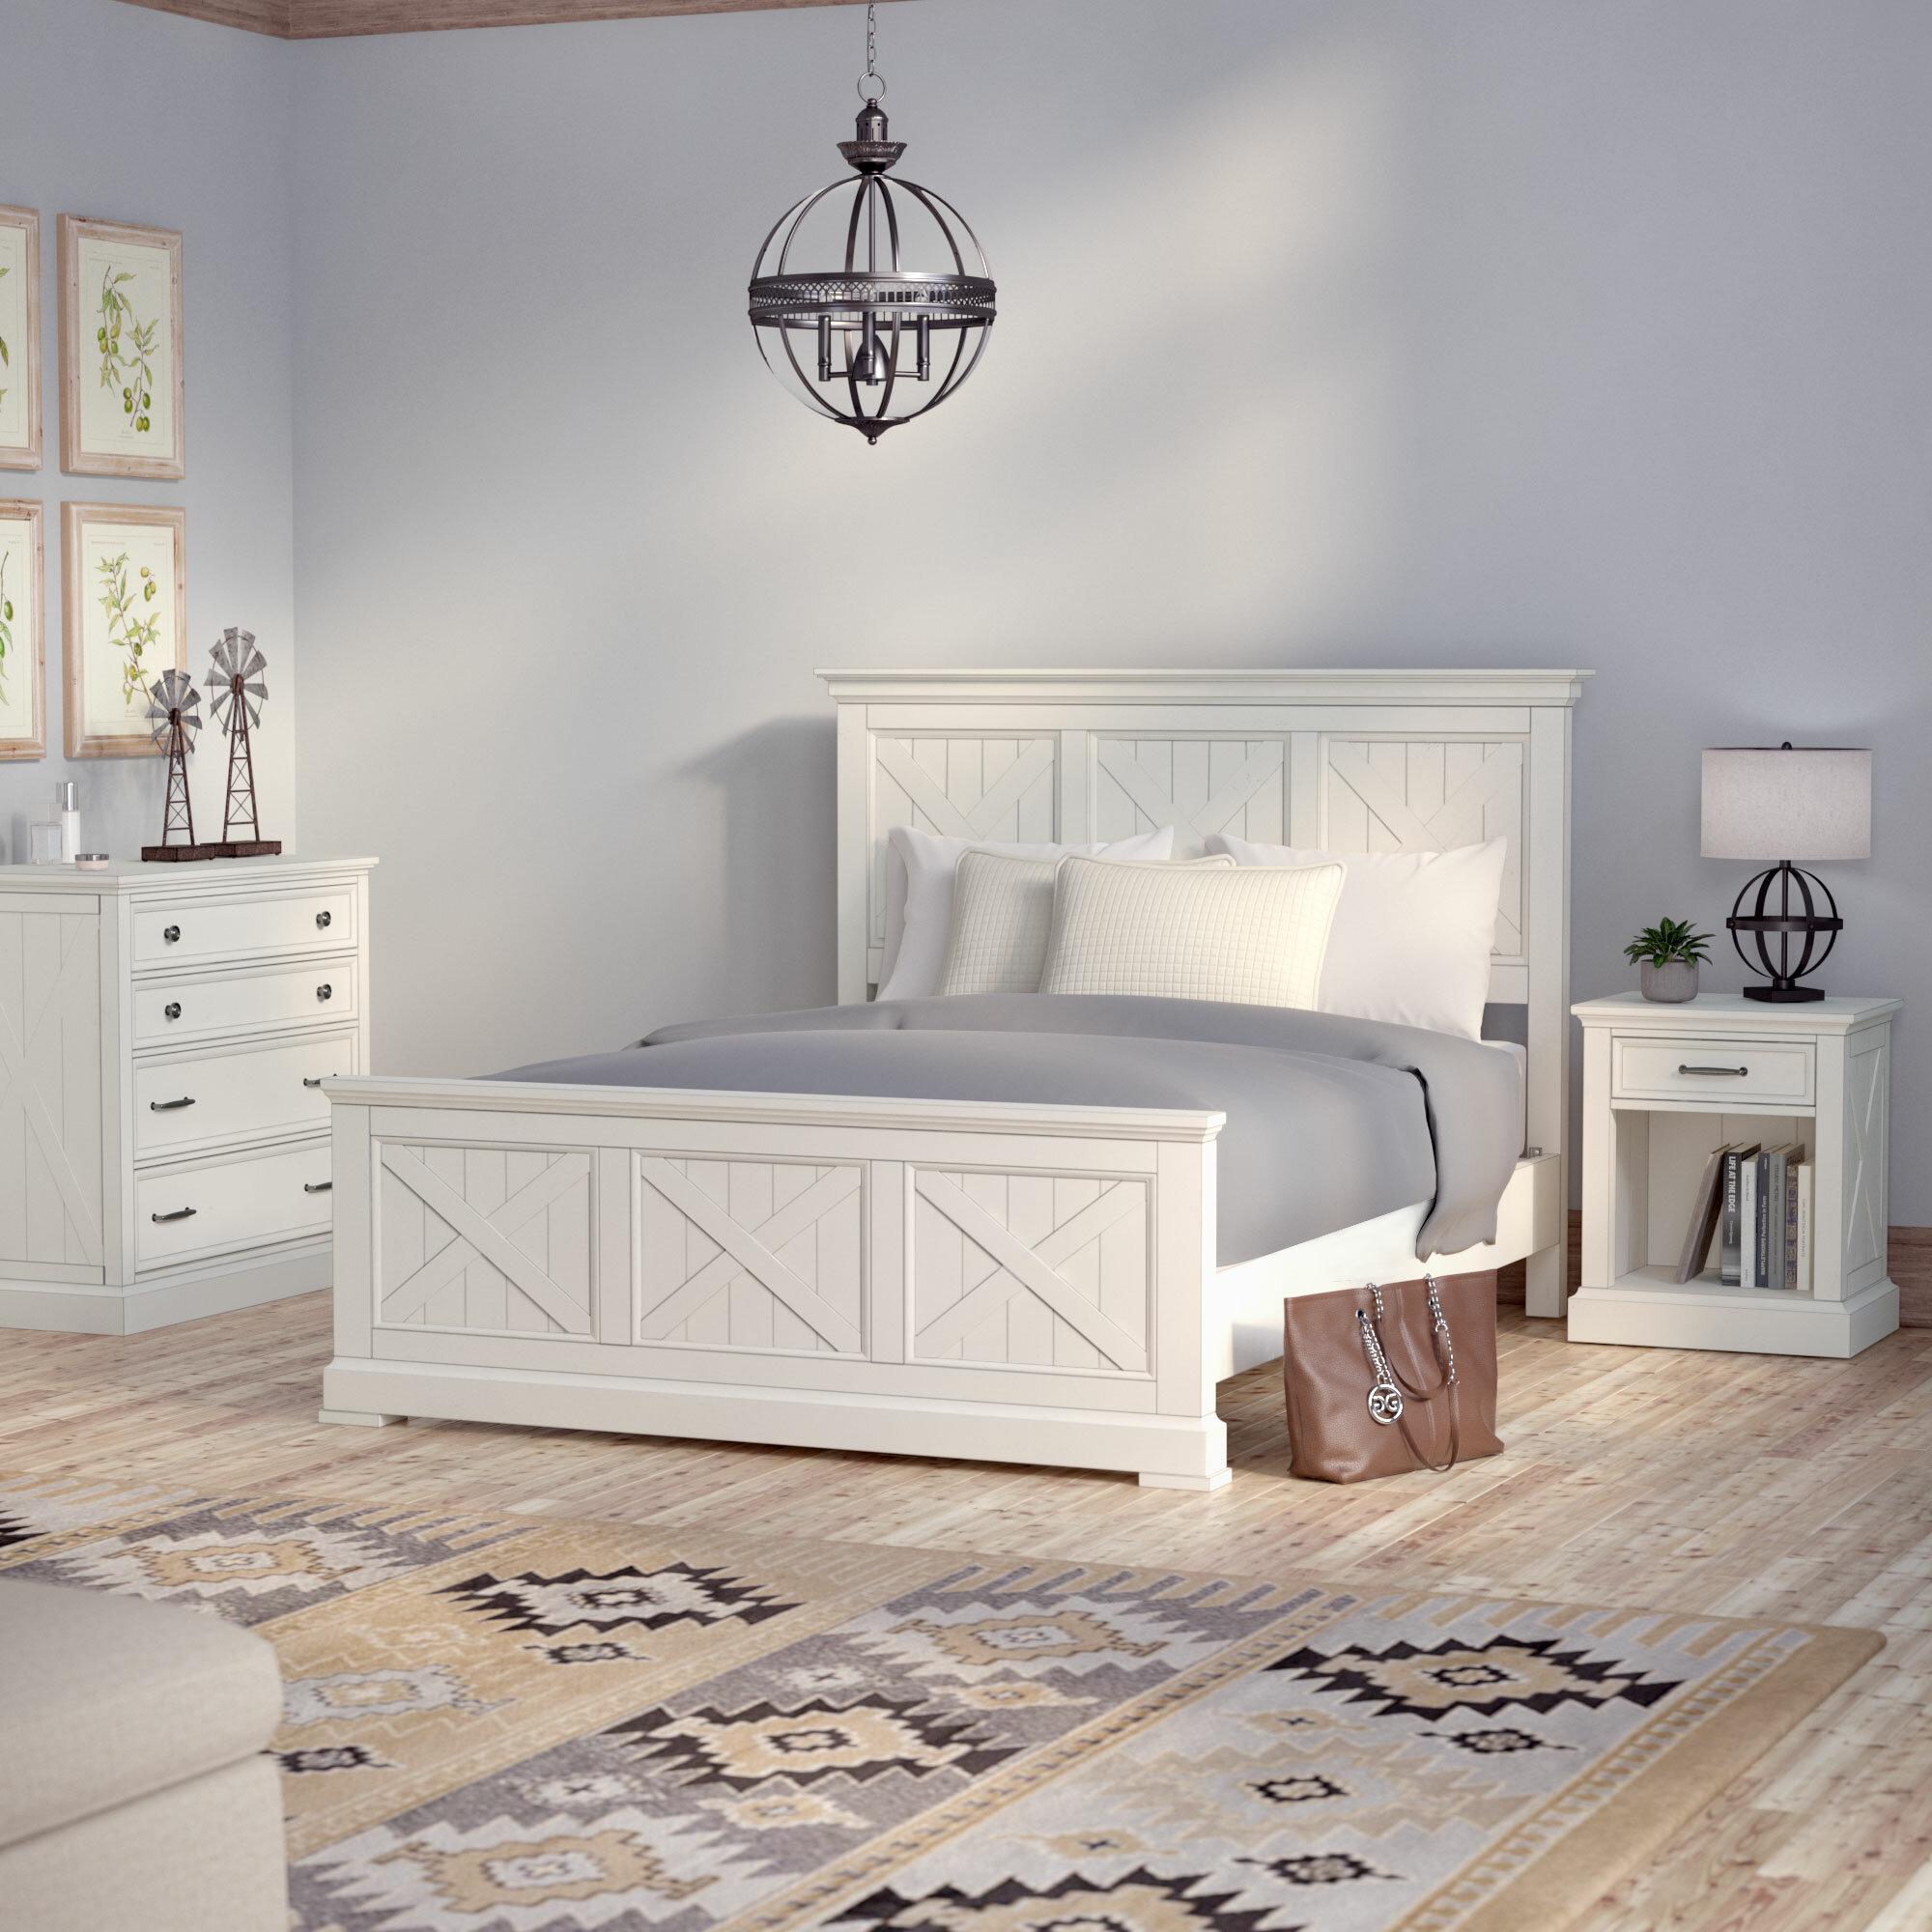 Birch Lane Lizotte Solid Wood Standard 3 Piece Bedroom Set Reviews Wayfair